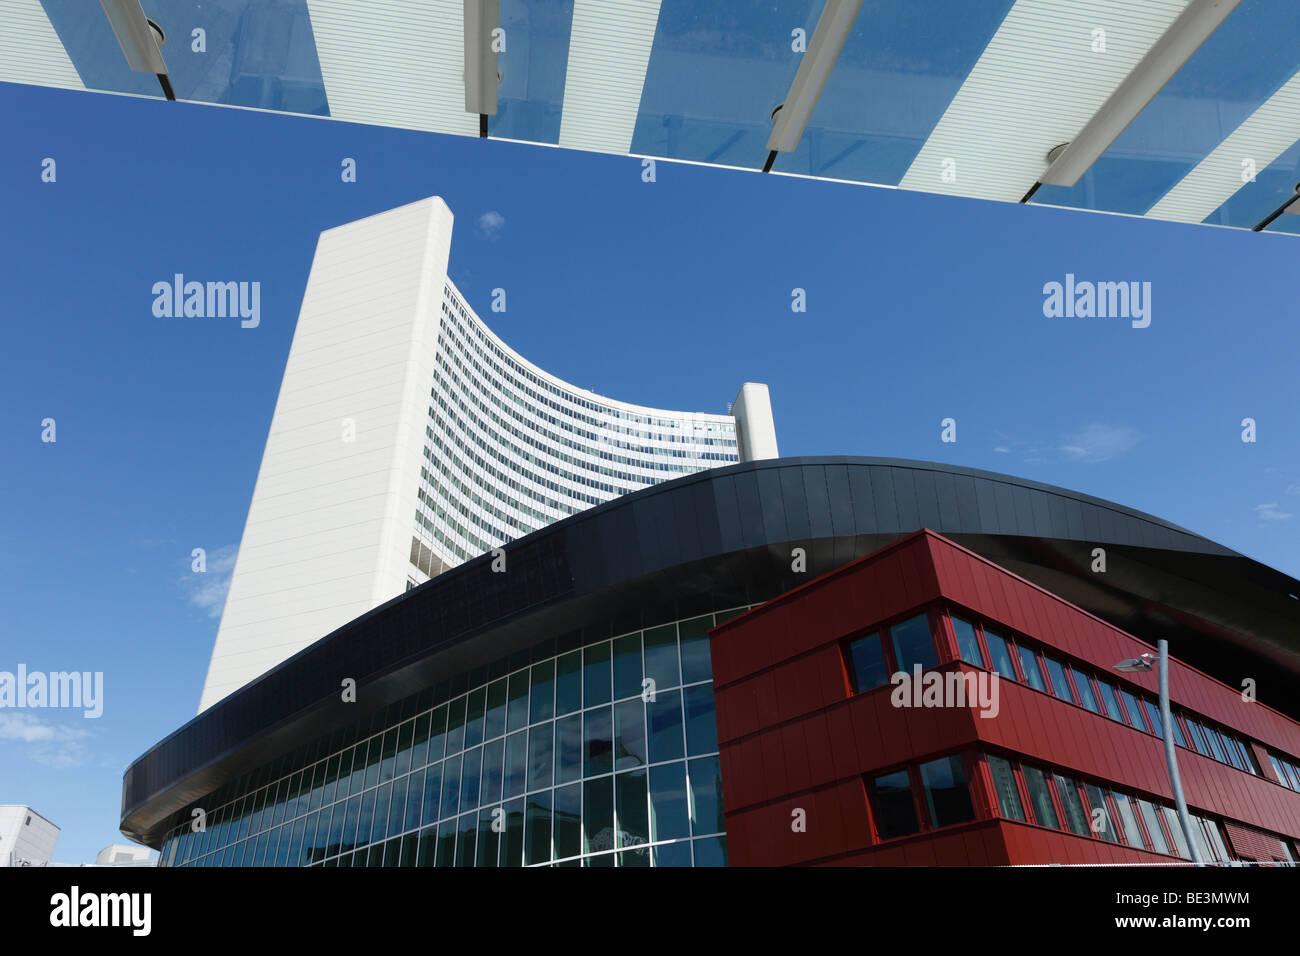 Austria Center Vienna, Donau City, UNO-City in the back, Vienna, Austria, Europe - Stock Image